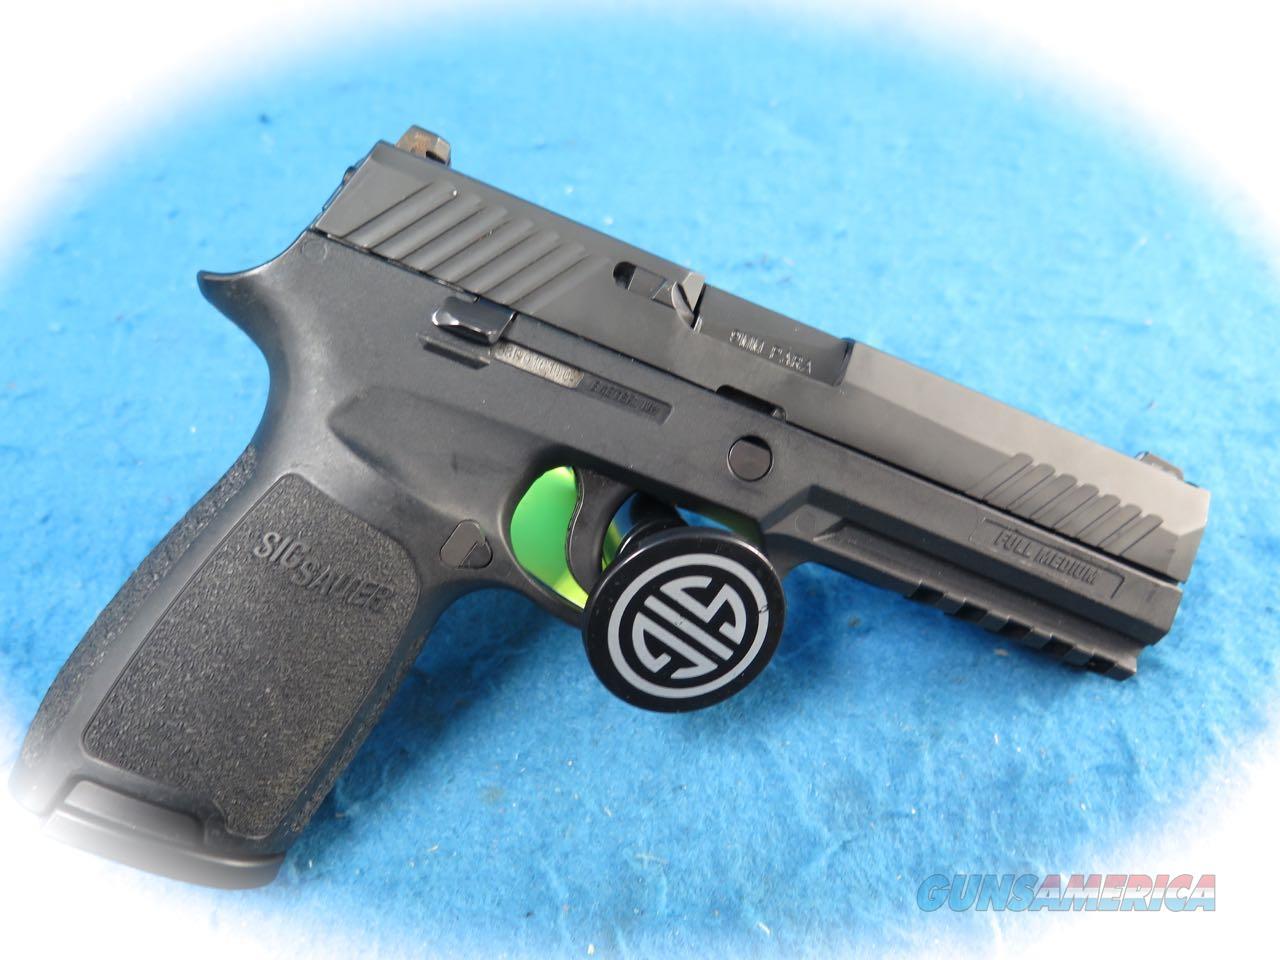 Sig Sauer P320 9mm Pistol **Used**  Guns > Pistols > Sig - Sauer/Sigarms Pistols > P320